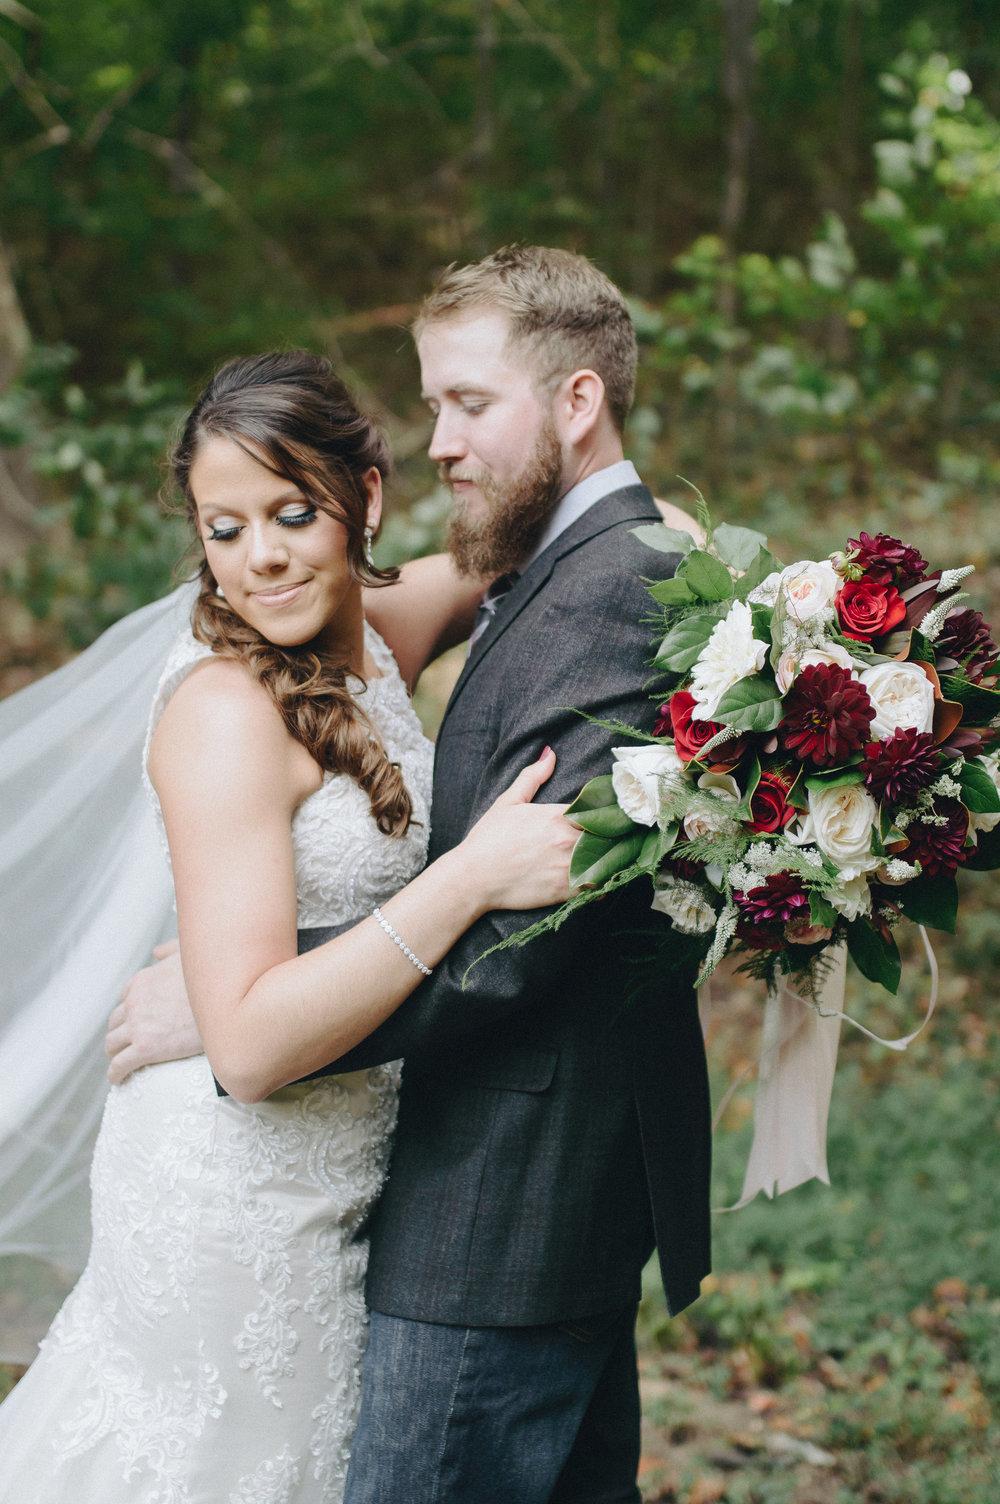 Lauren_Dustin_Wedding - EDITS-10.jpg